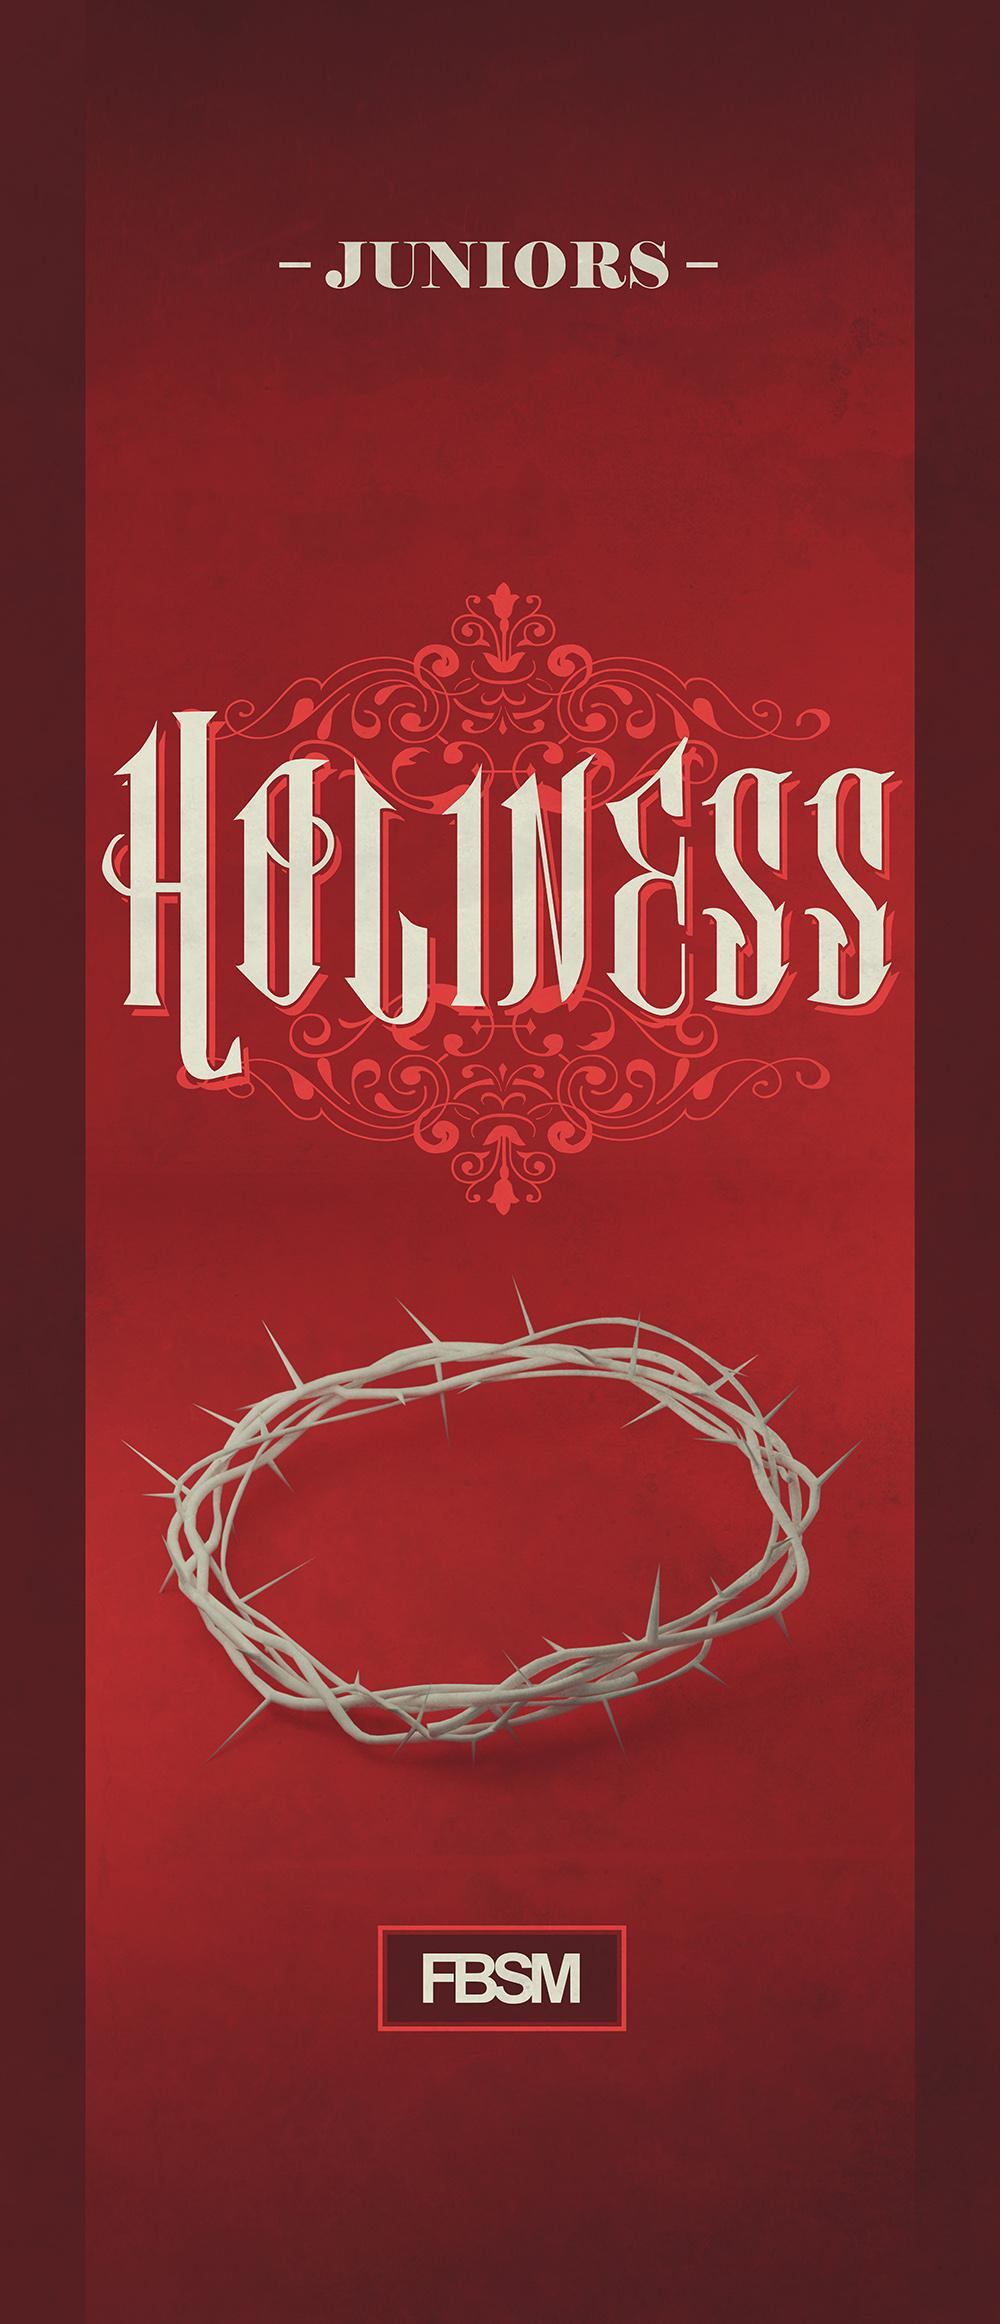 Poster  - Holiness 1.jpg